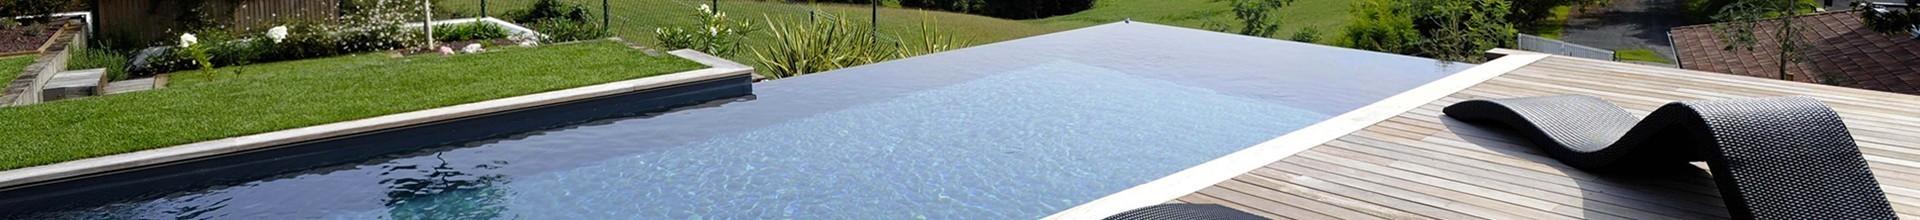 Direct usine, piscine coque prix Nièvre